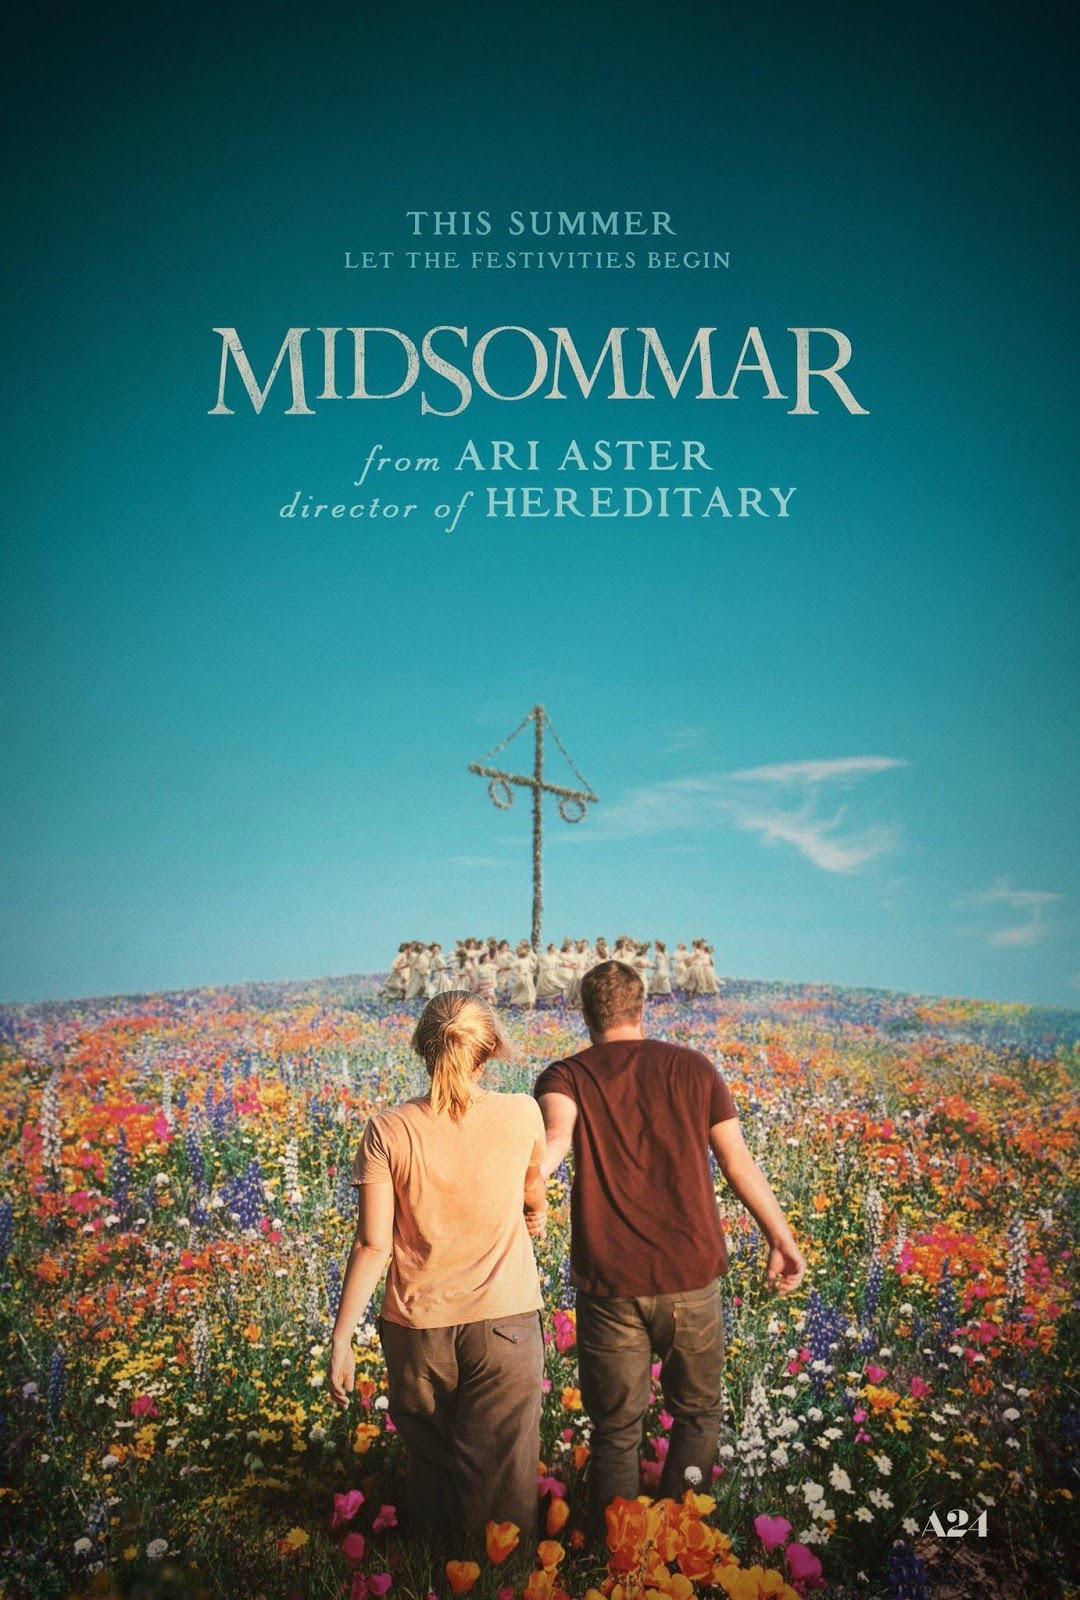 midsommar-poster-1598024444.jpg